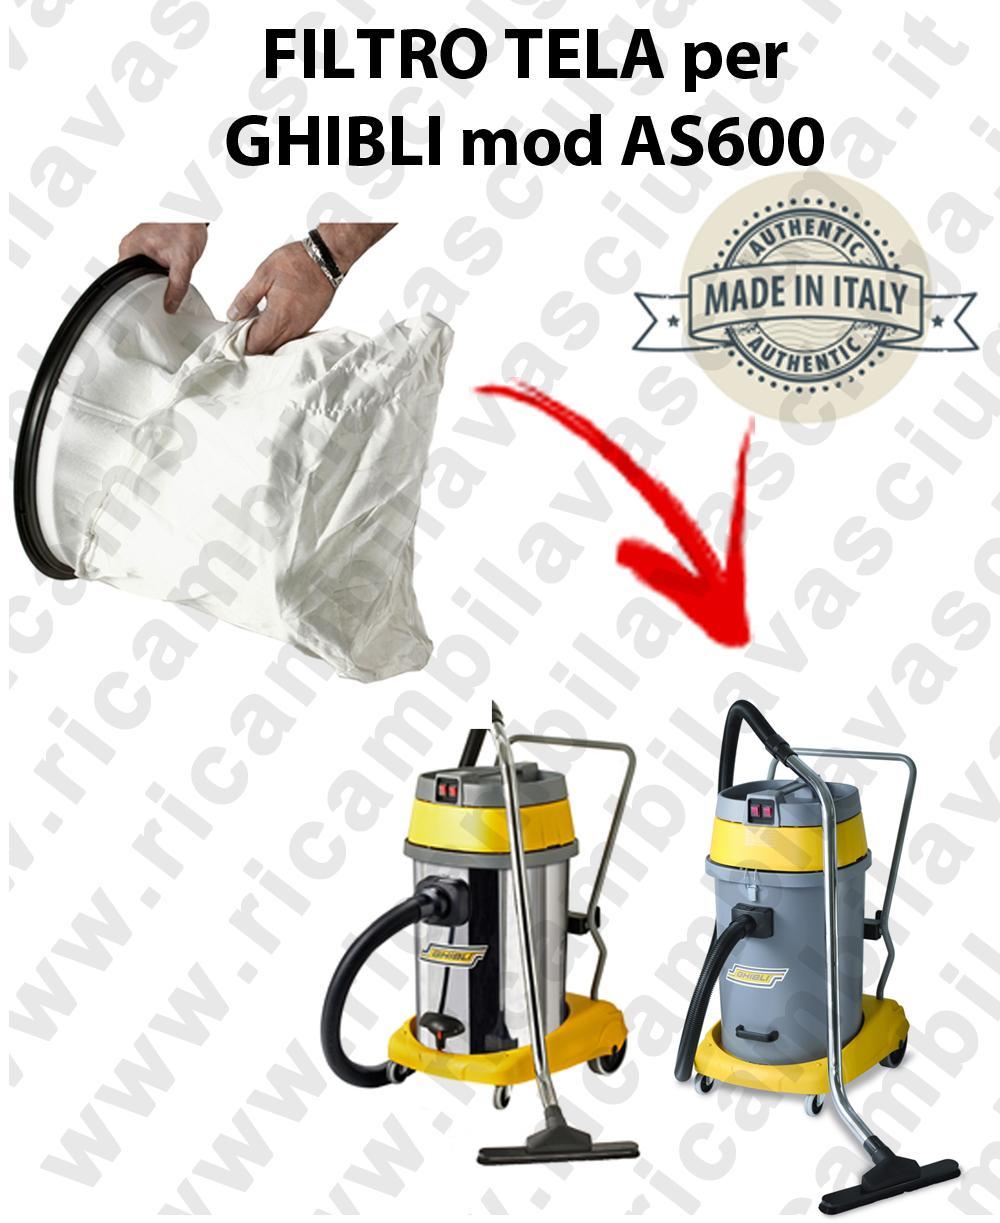 SACCO Filtro de Nylon cod: 3001220 para aspiradora GHIBLI Model AS600